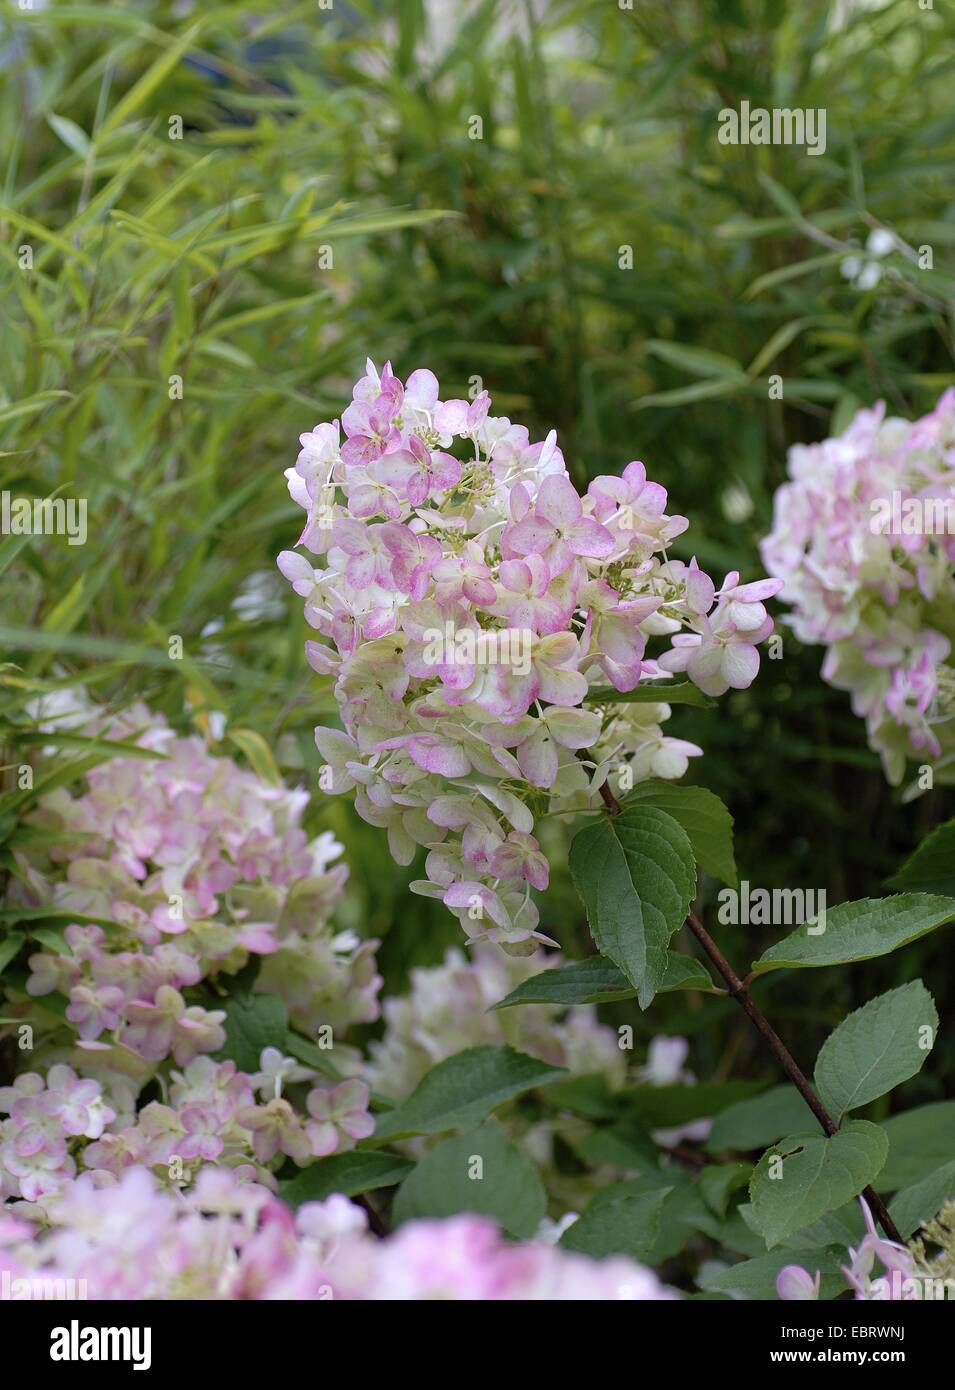 Panicule hortensia (Hydrangea paniculata 'unique', Hydrangea paniculata Unique), le cultivar, la floraison Photo Stock